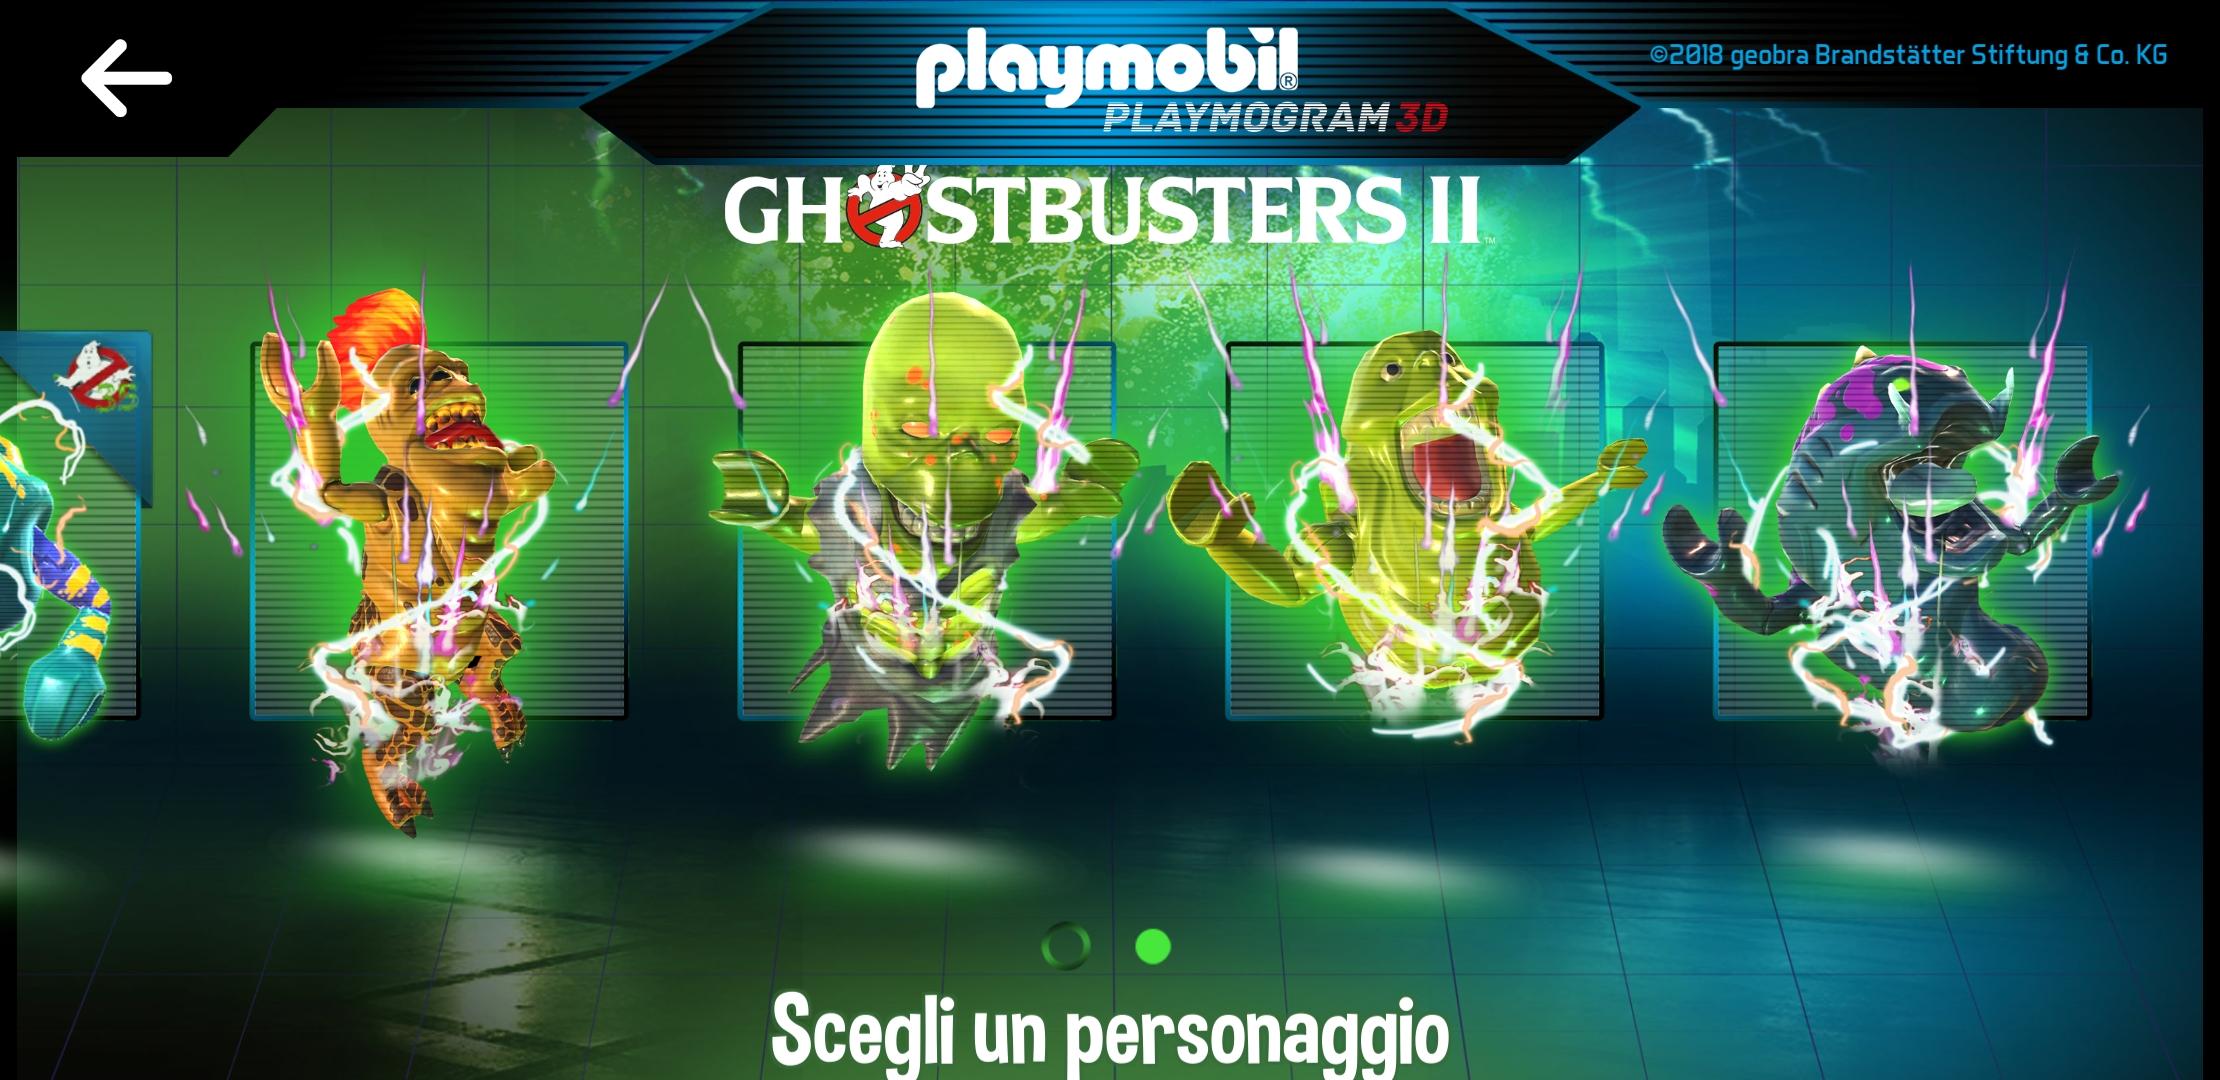 Playmobil Egon Spengler Ghostbusters II ectoplasma Slimer ologramma Antro docmanhattan